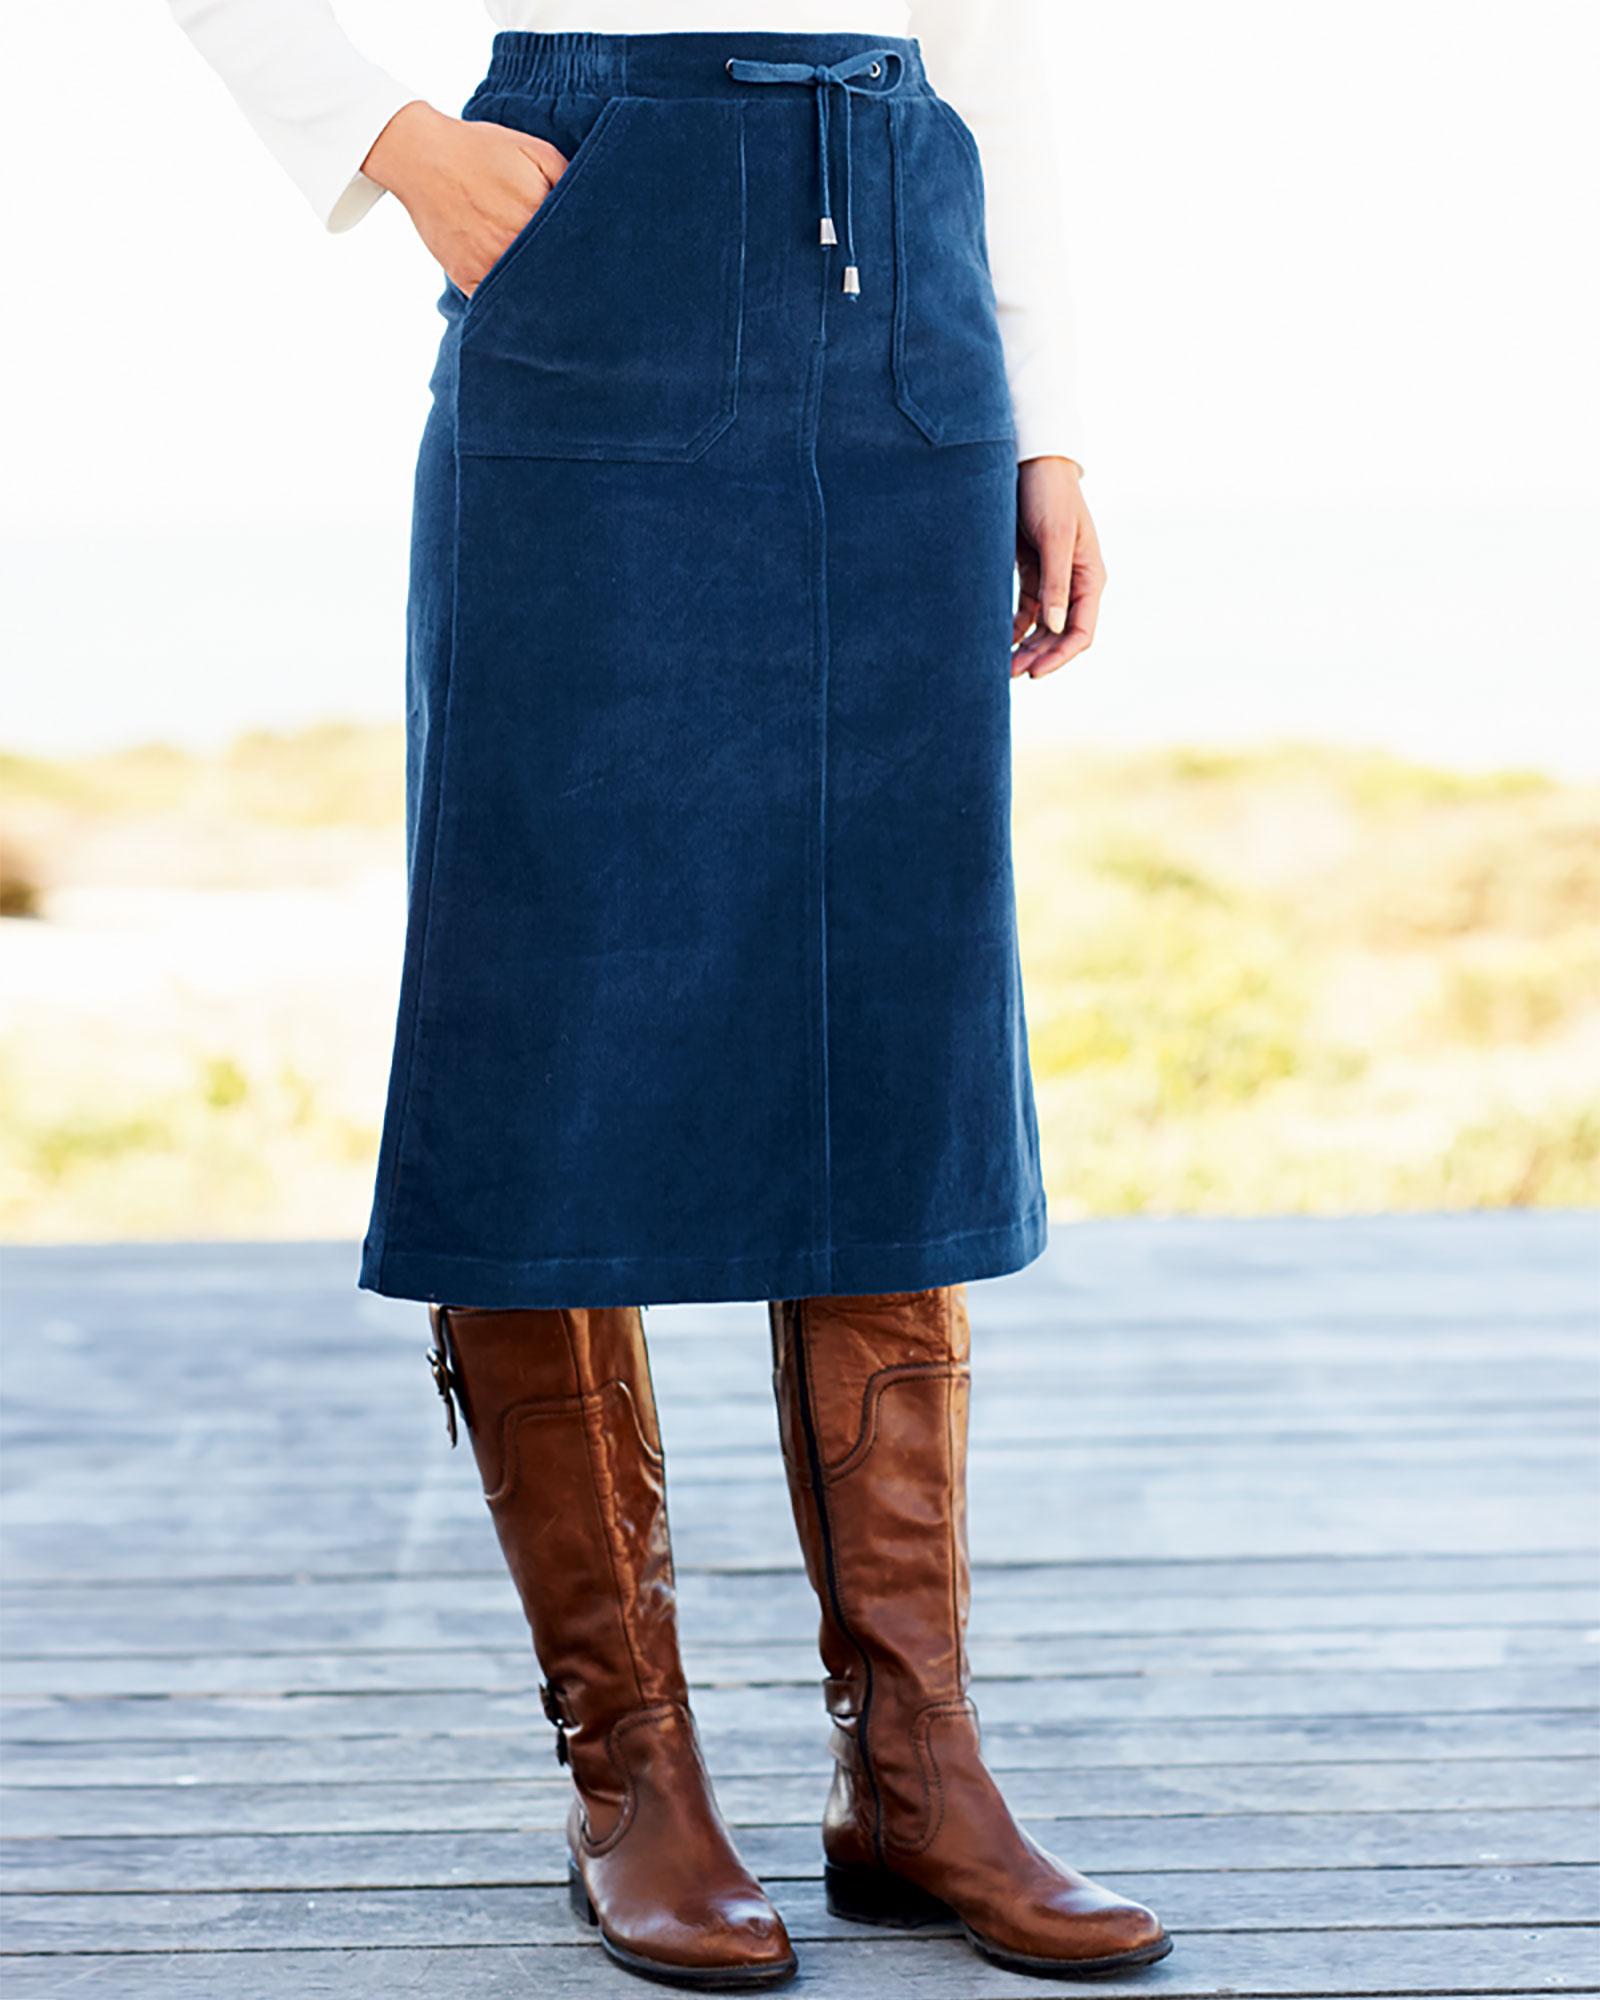 b86c82c4b Brown Corduroy Skirt Uk